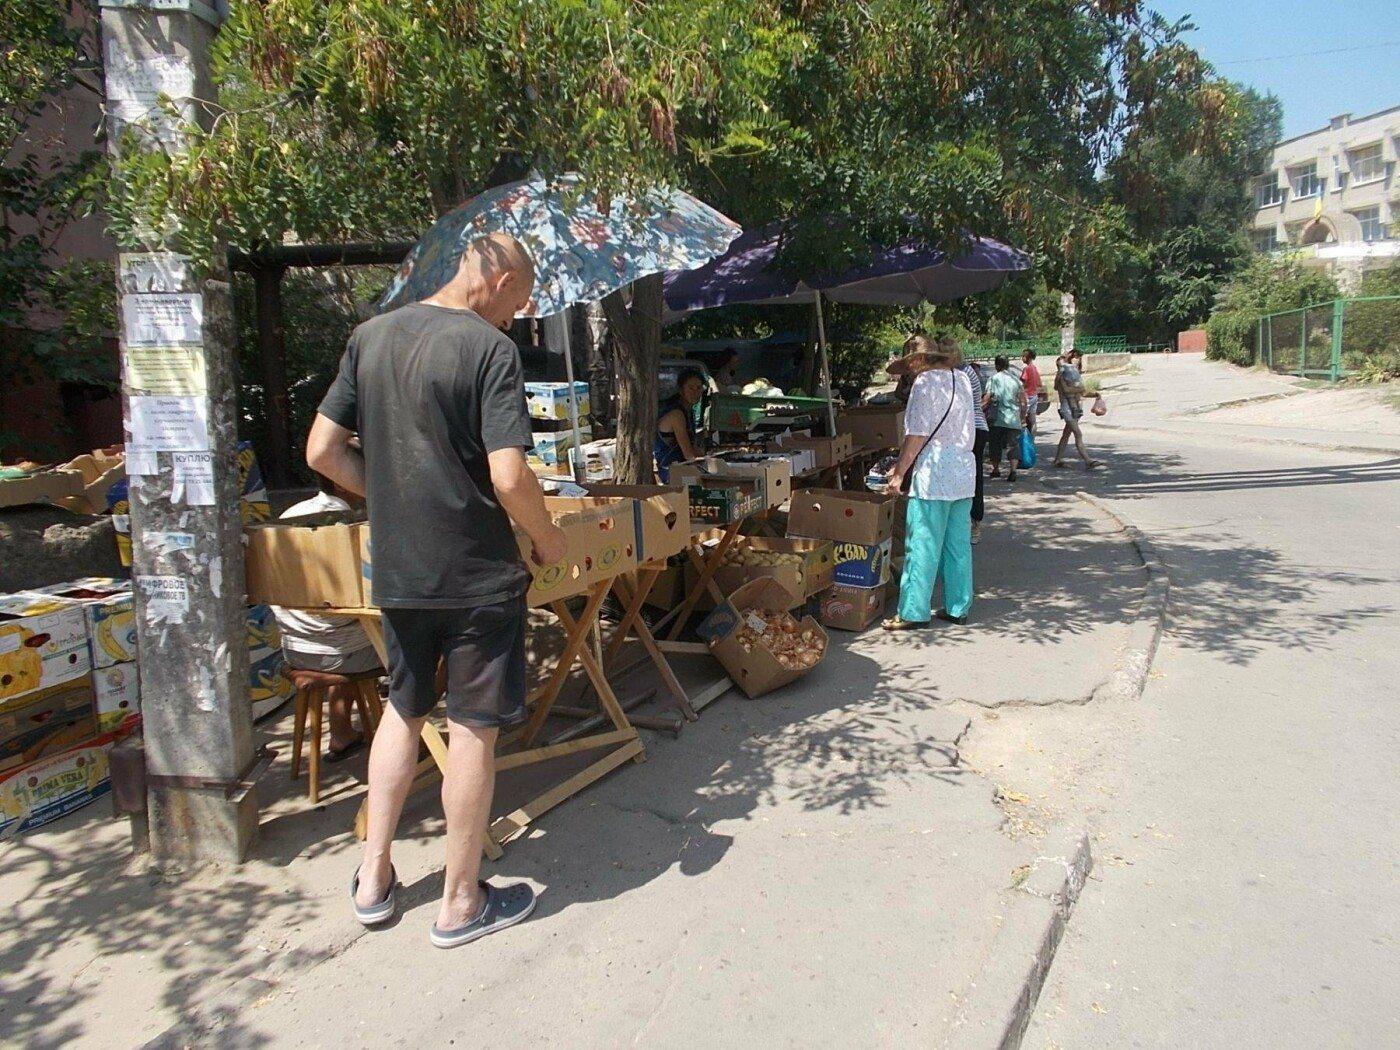 торговля, улицы, коммерсанты, базары